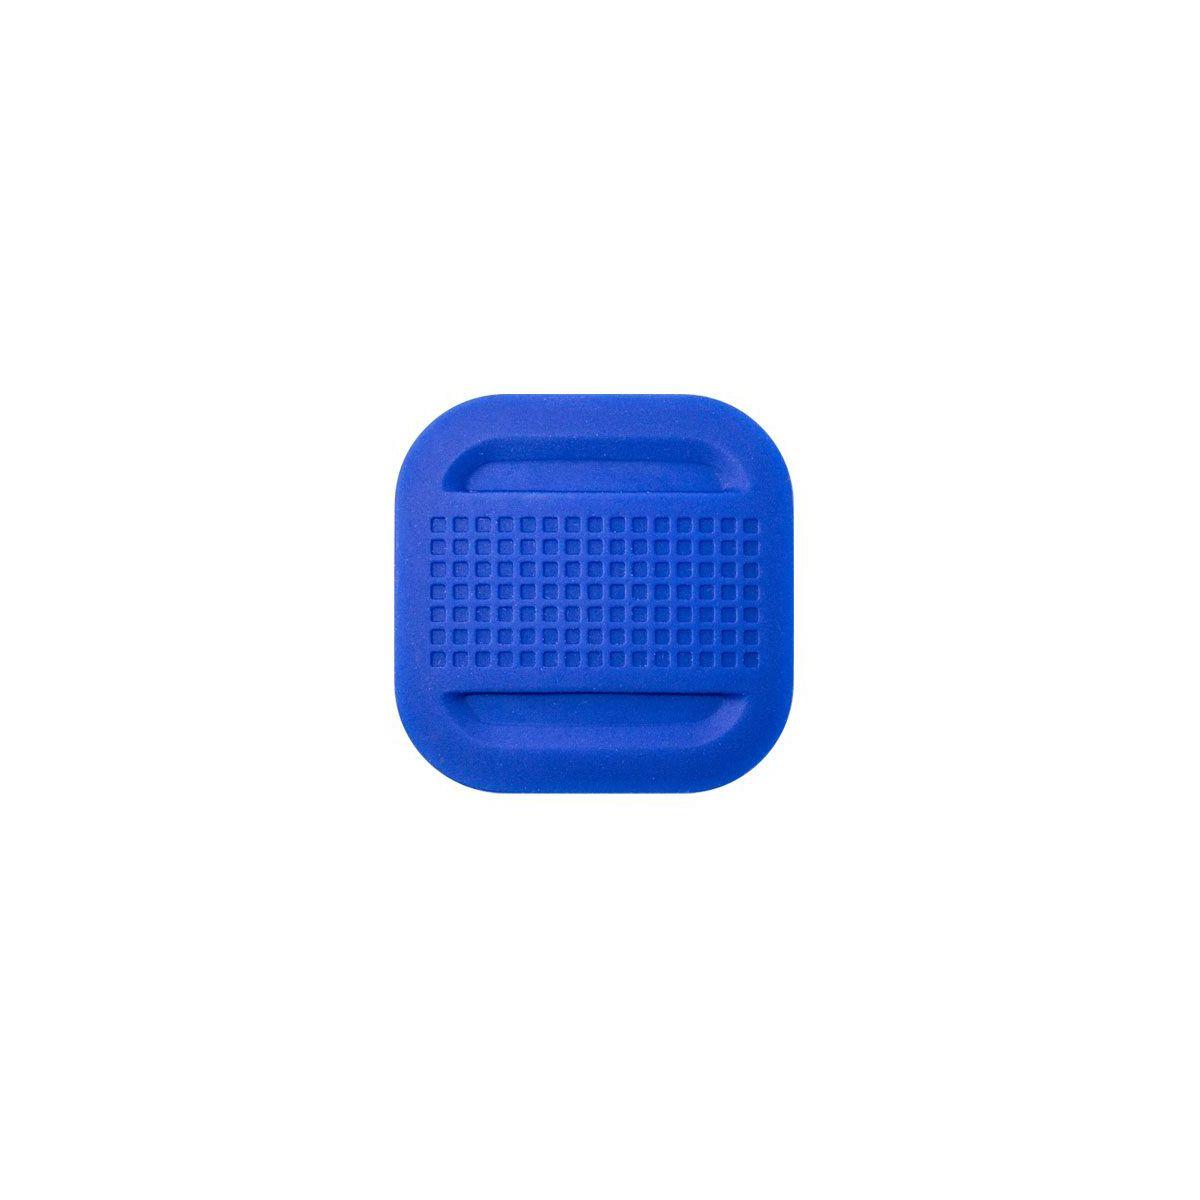 Bouton connecté NODON Niu Tech Blue